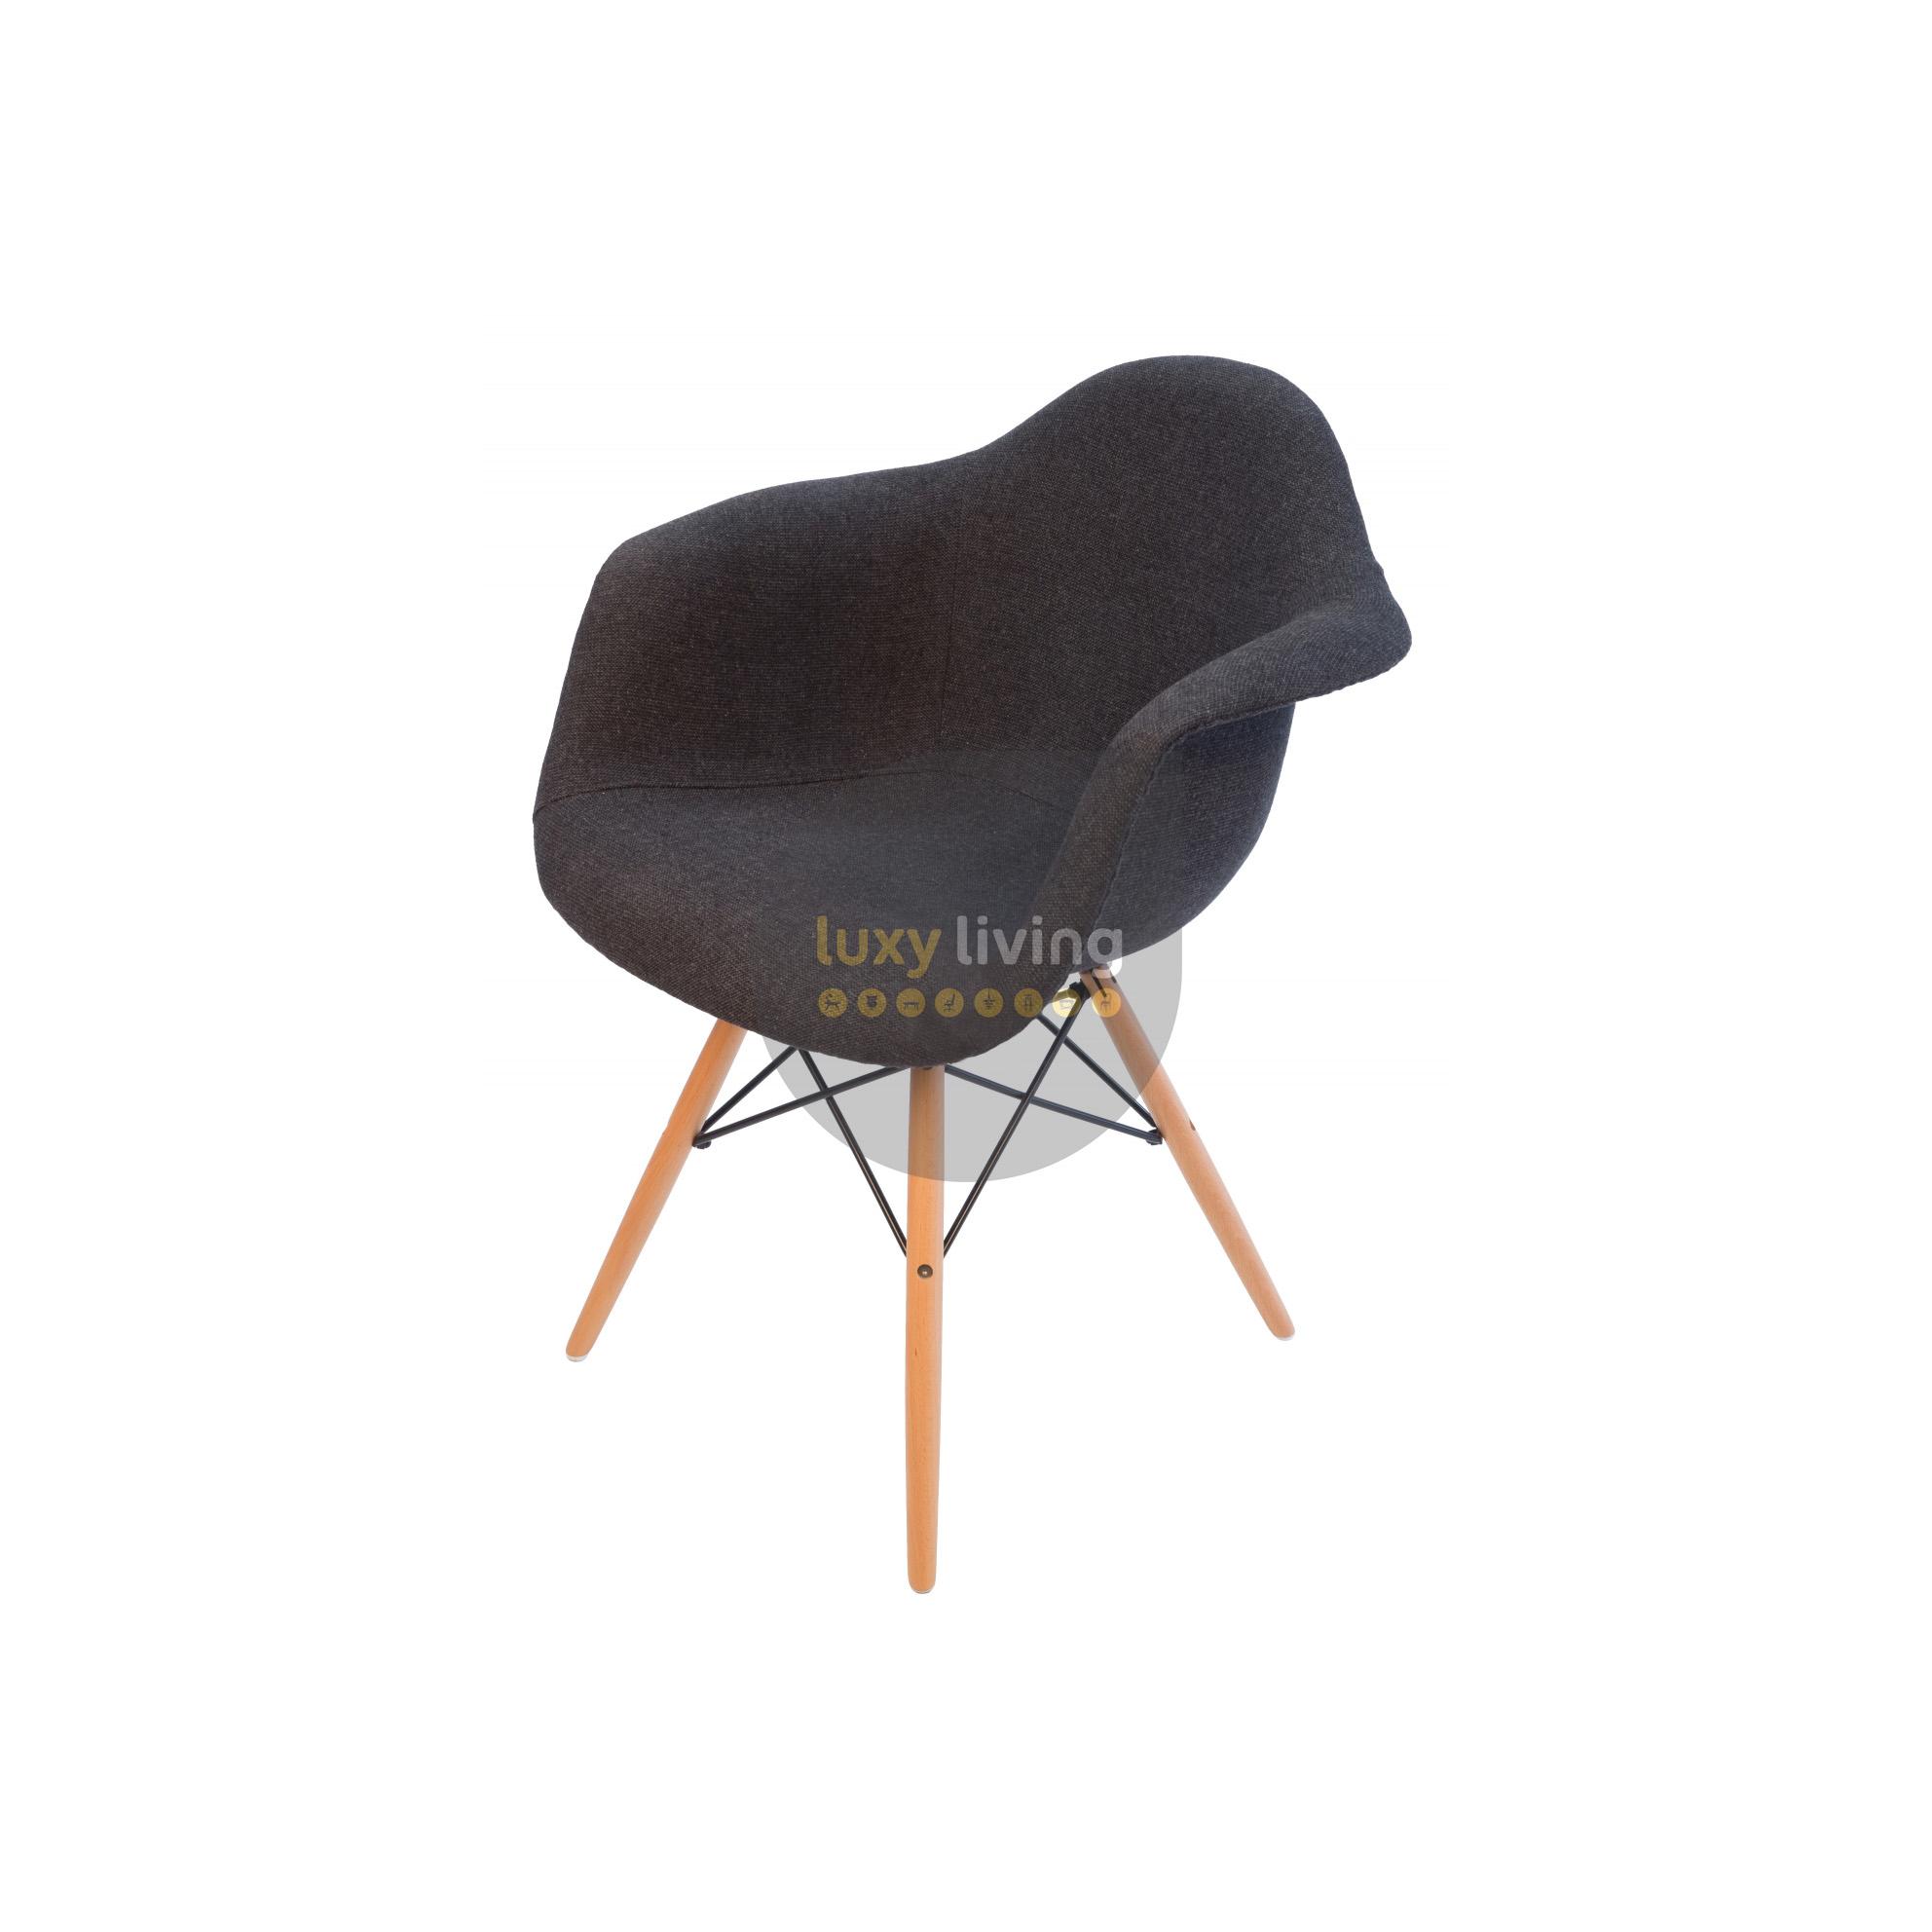 sc 1 st  Luxy Living & Replica Eames DAW Eiffel Chair u2013 Grey / Charcoal Fabric u0026 Natural Legs